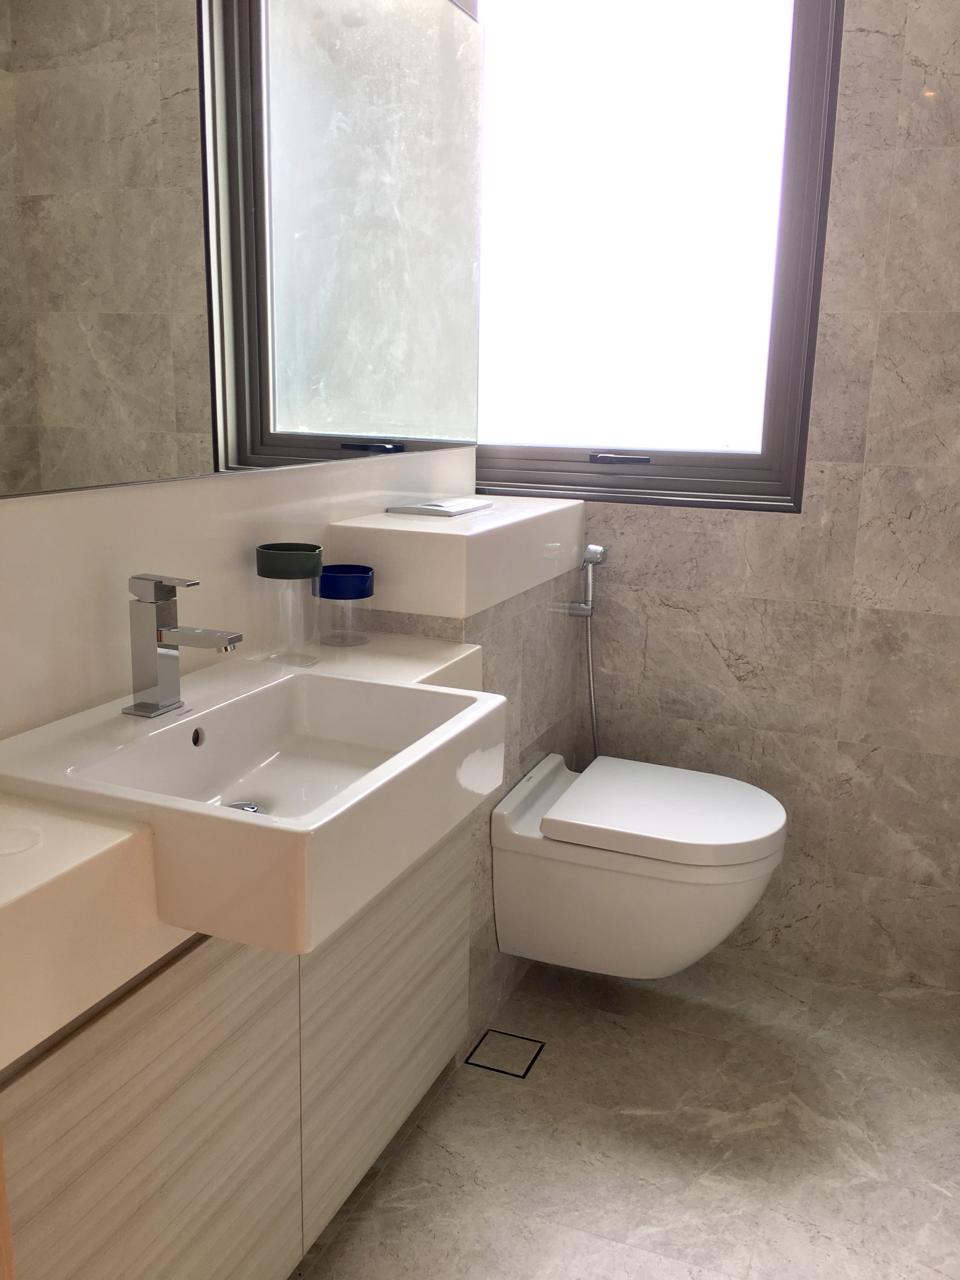 6 derbyshire 4 derbyshire road 3 bedrooms 1012 sqft - Bathroom cabinets singapore ...